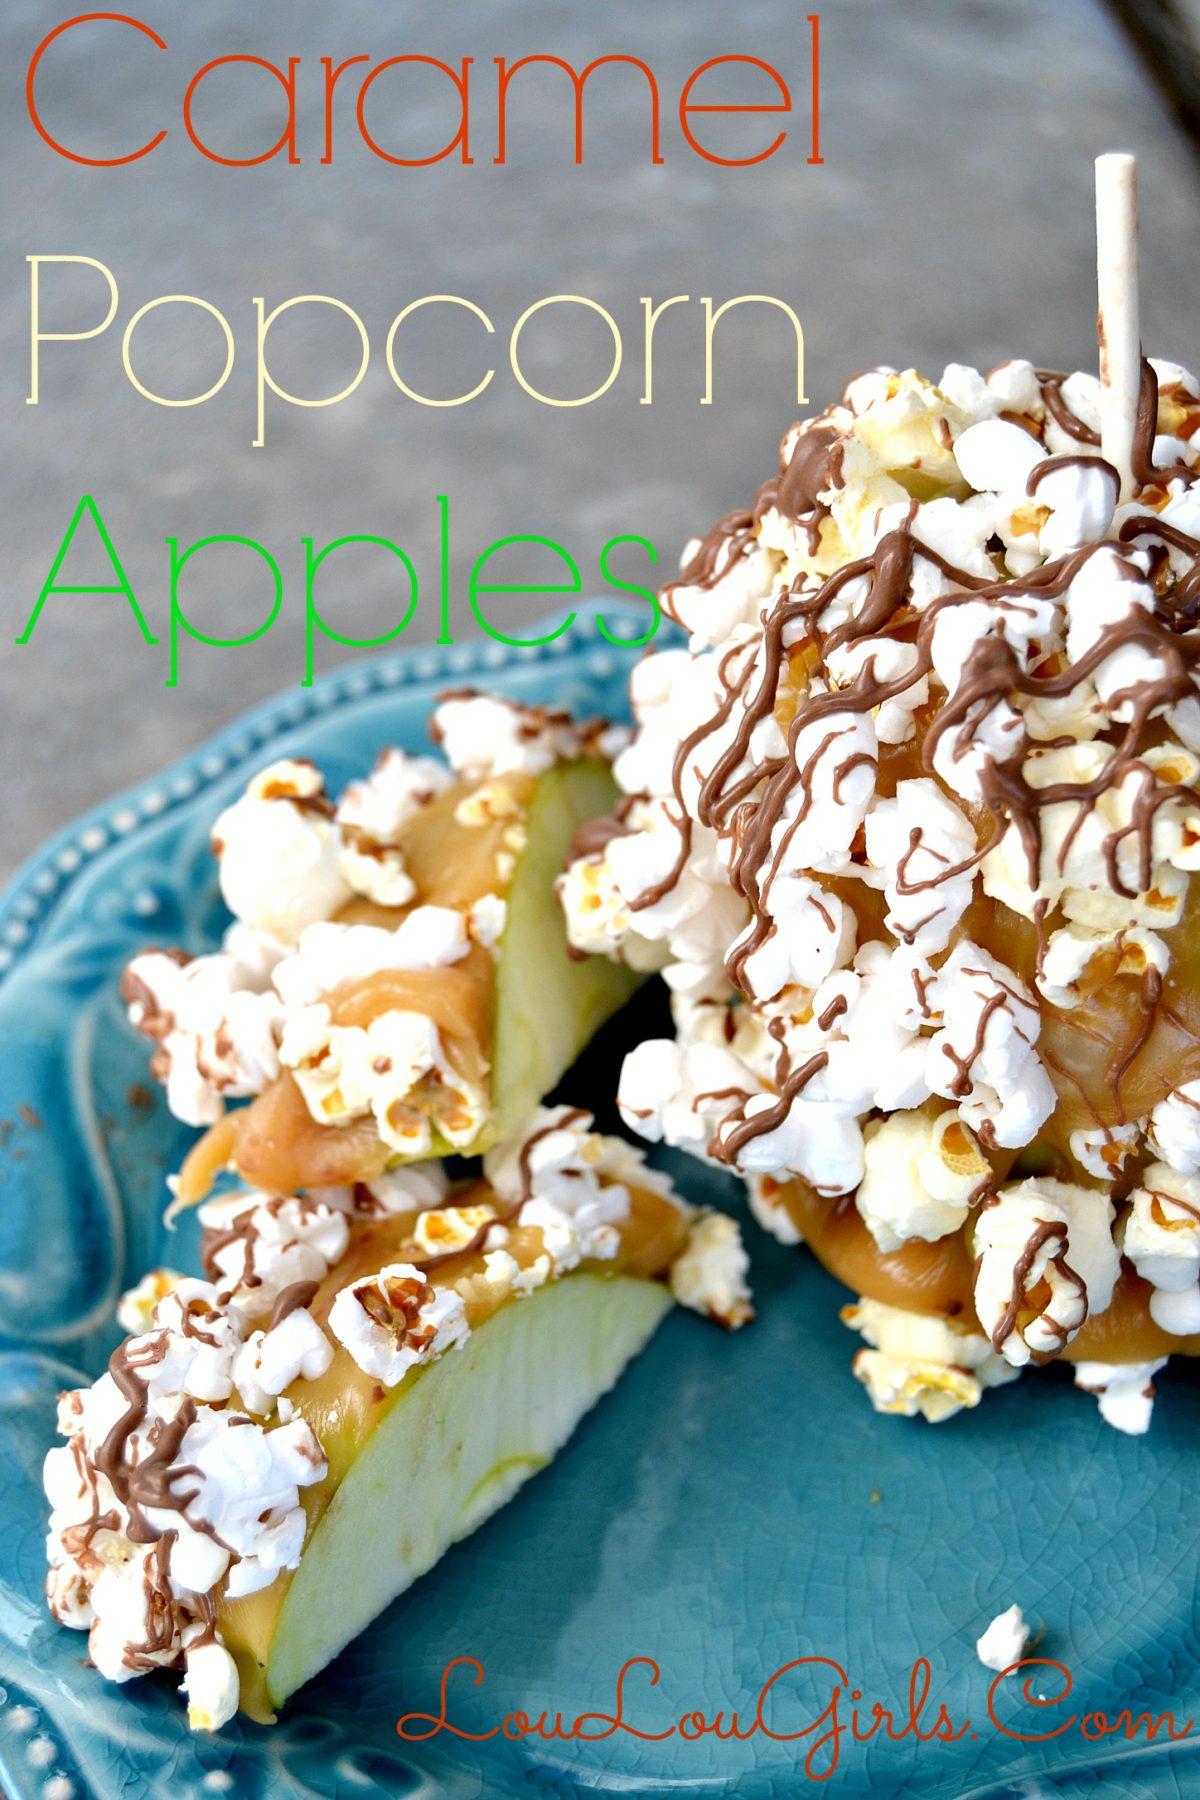 Caramel-popcorn-apples-chocolate-1200x1800